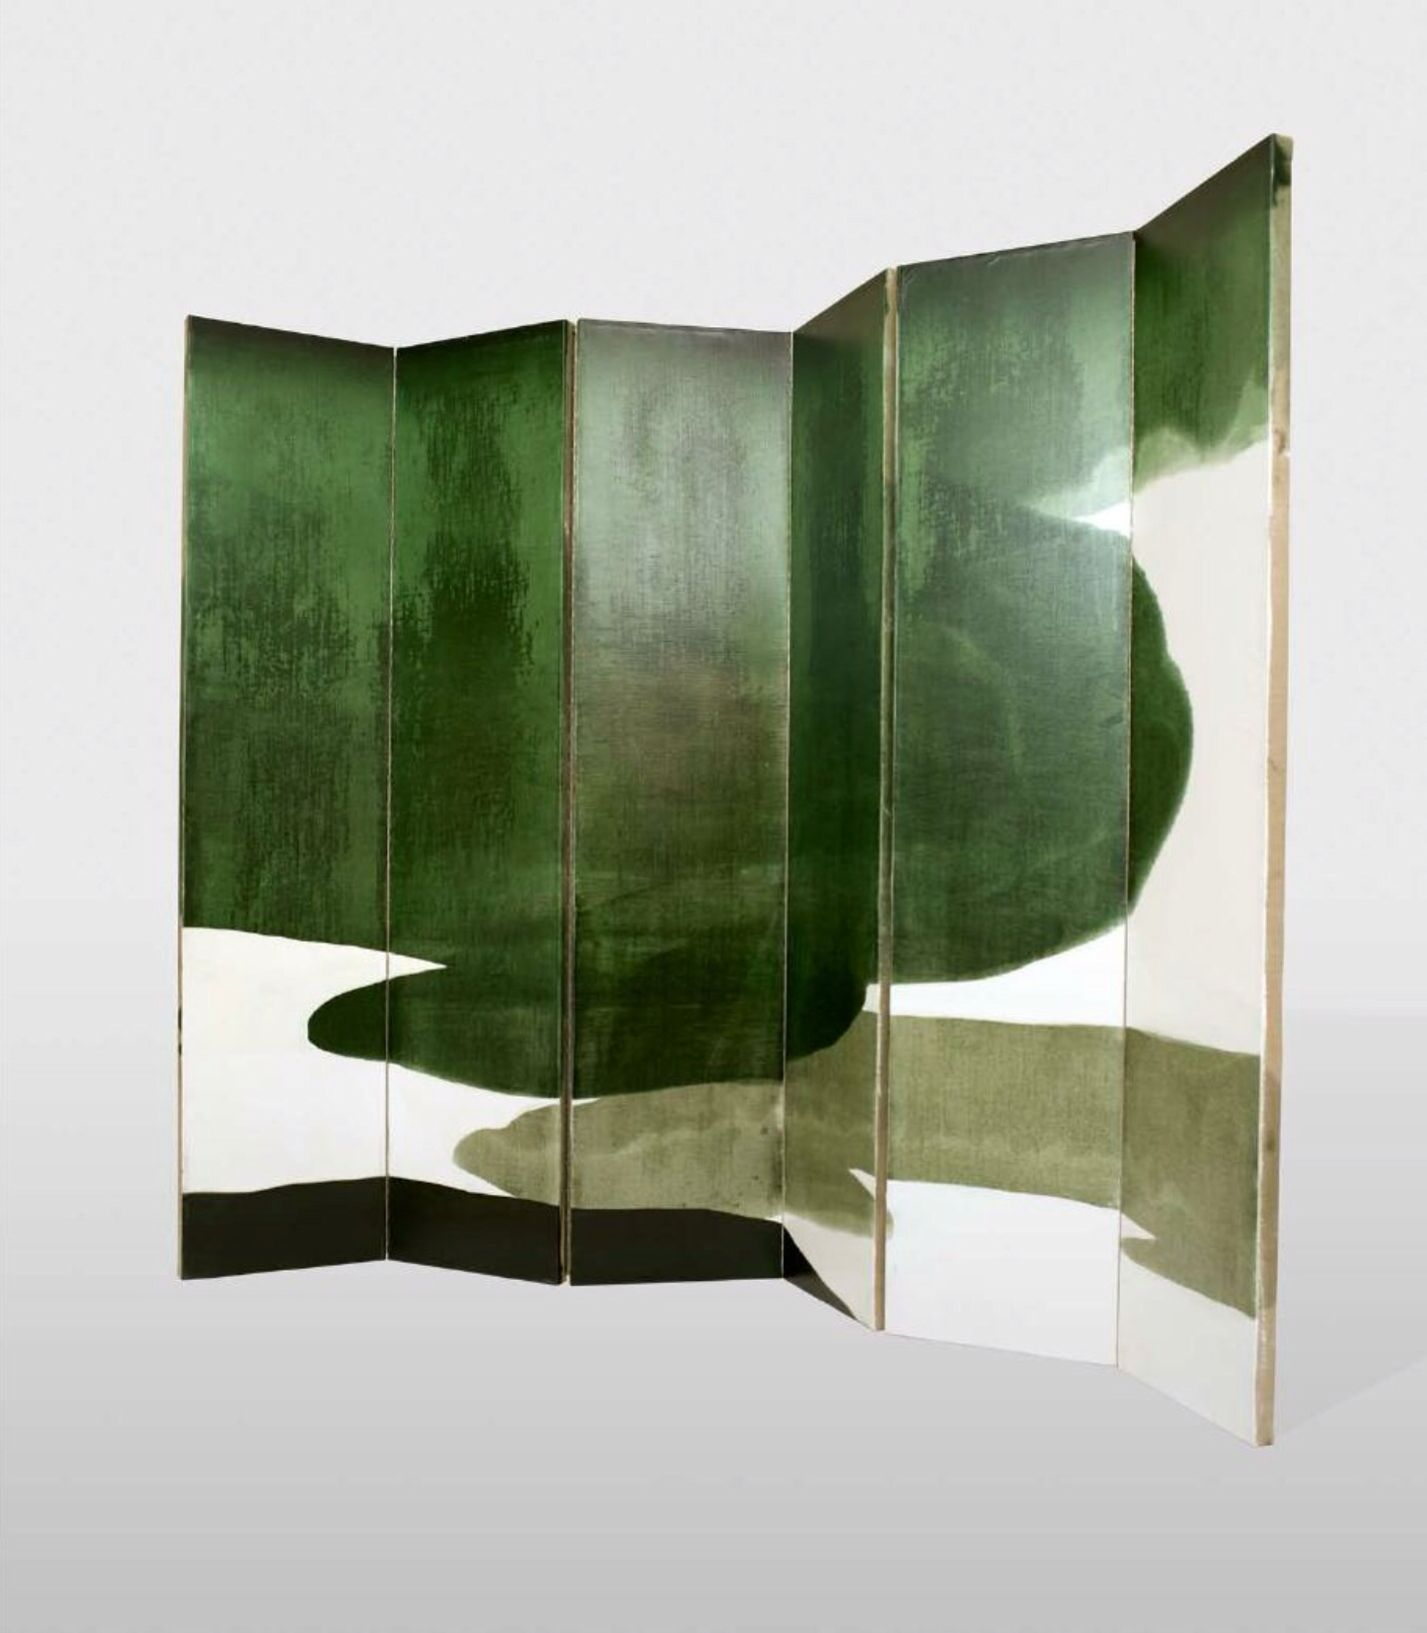 Antonio murado home pinterest screens interiors and divider